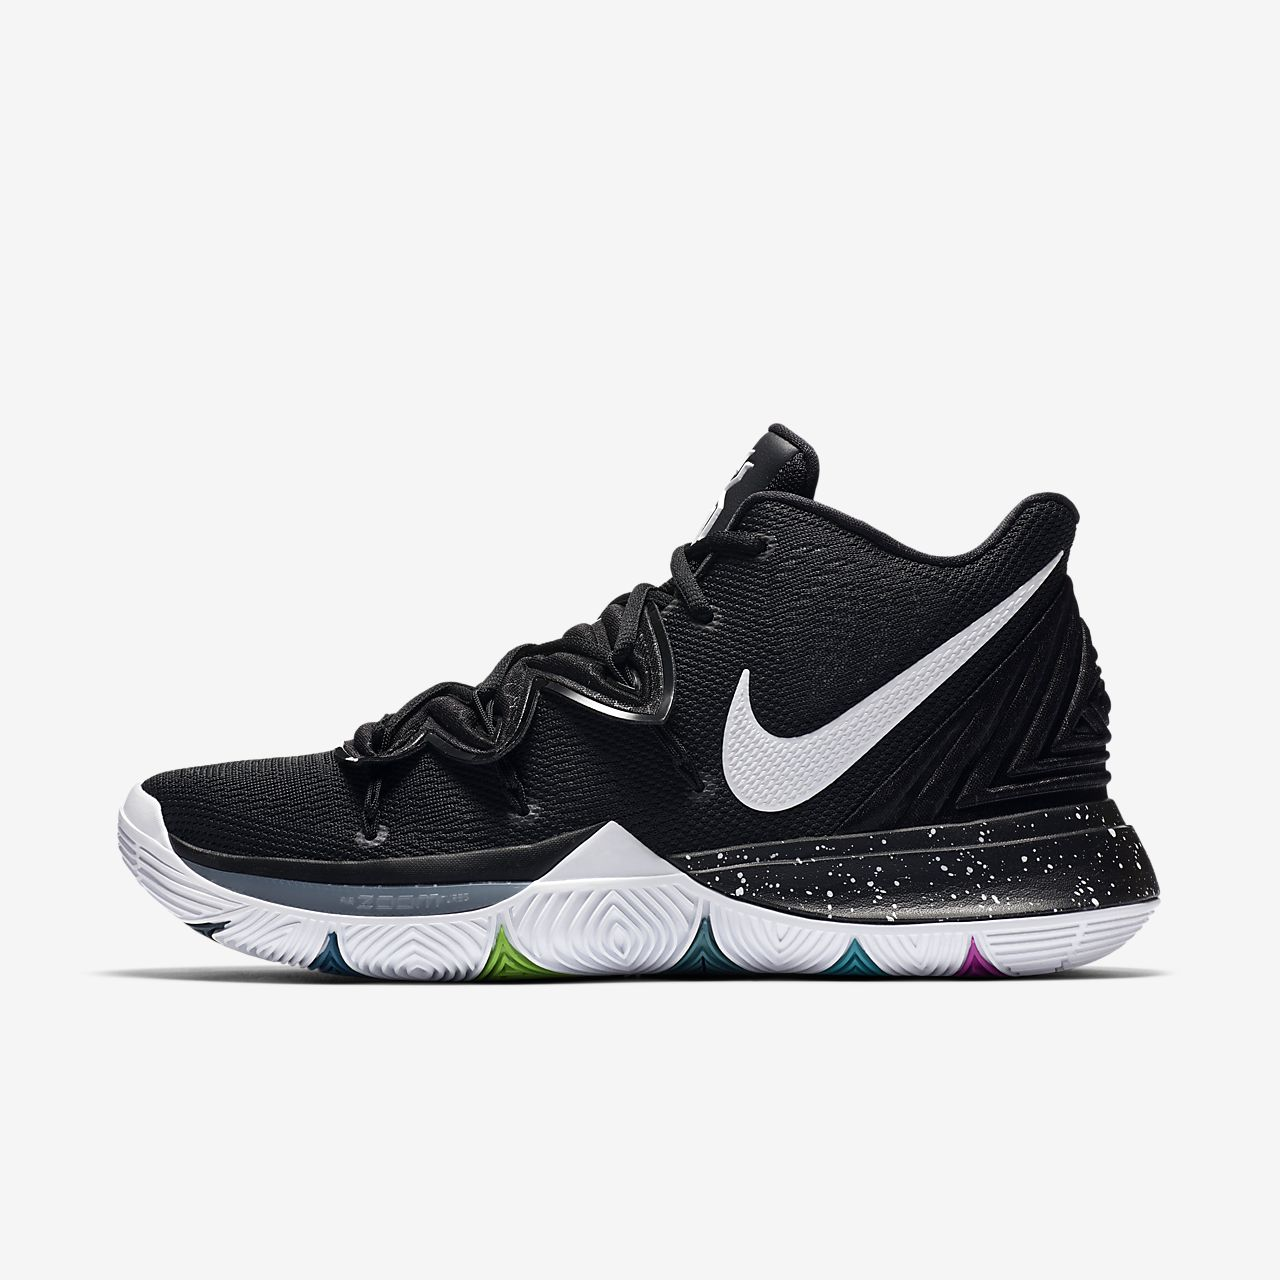 scarpe kyrie donna nero